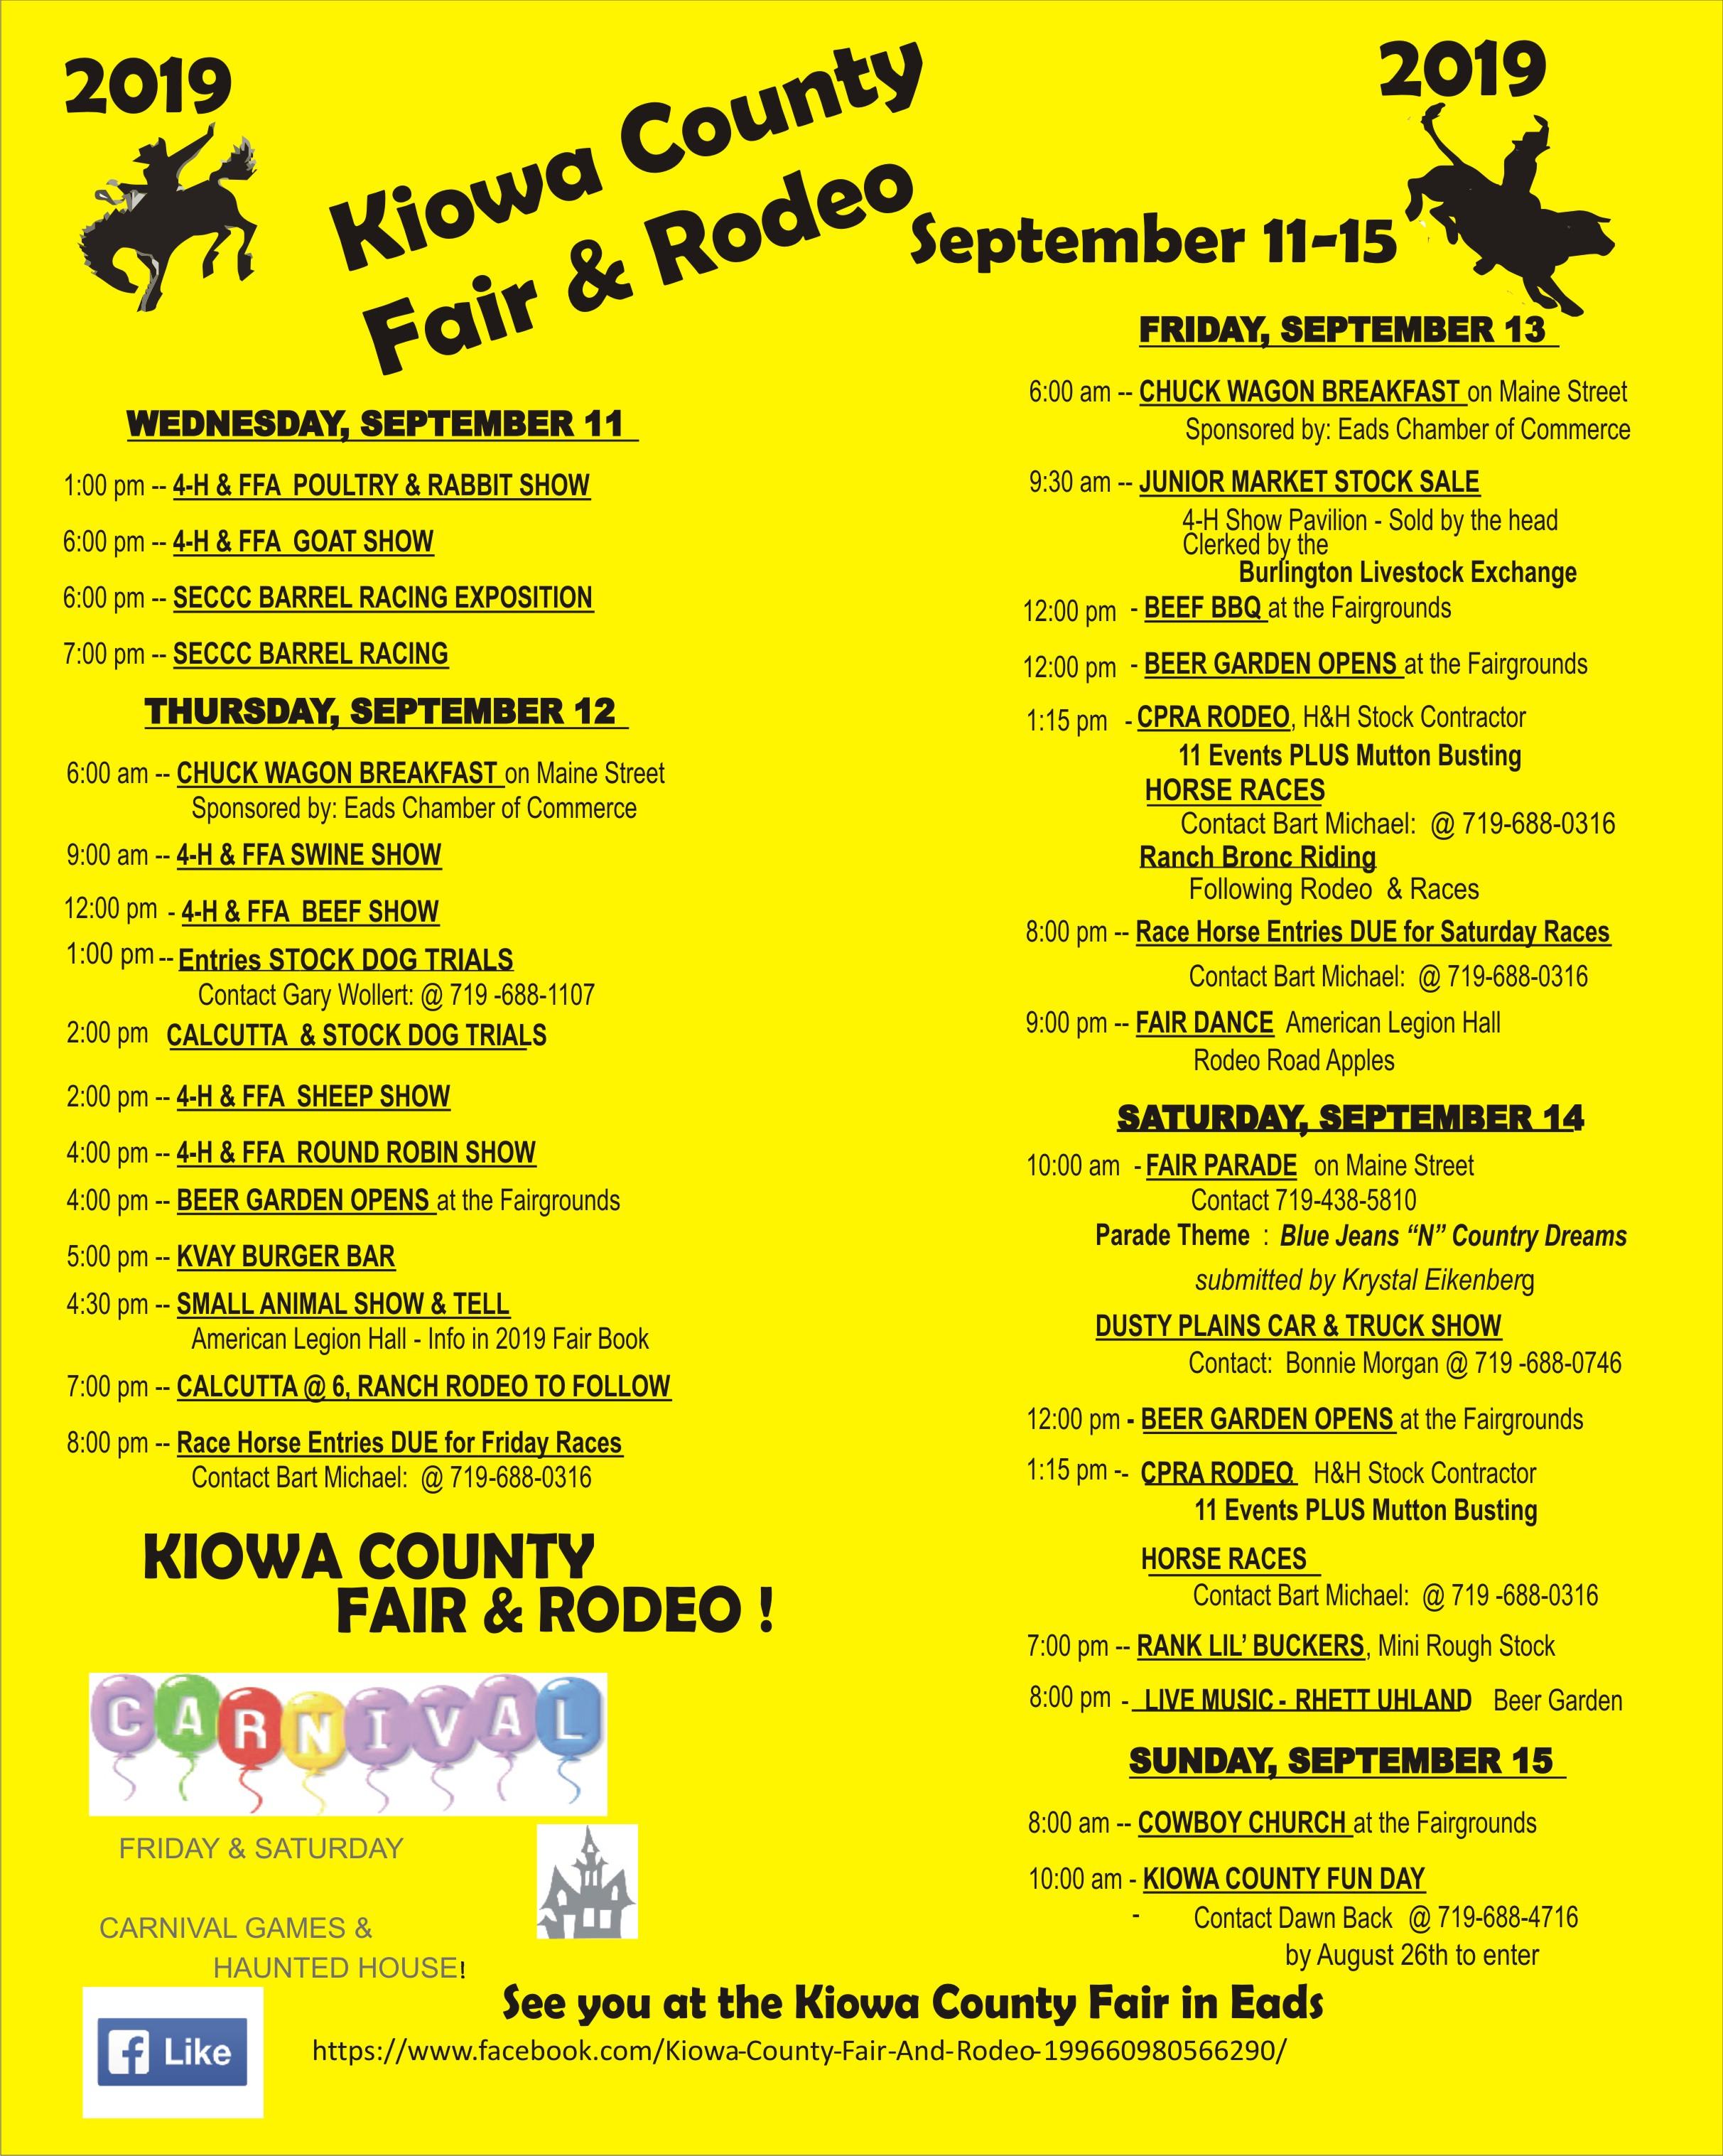 2019 Kiowa County Fair flyer